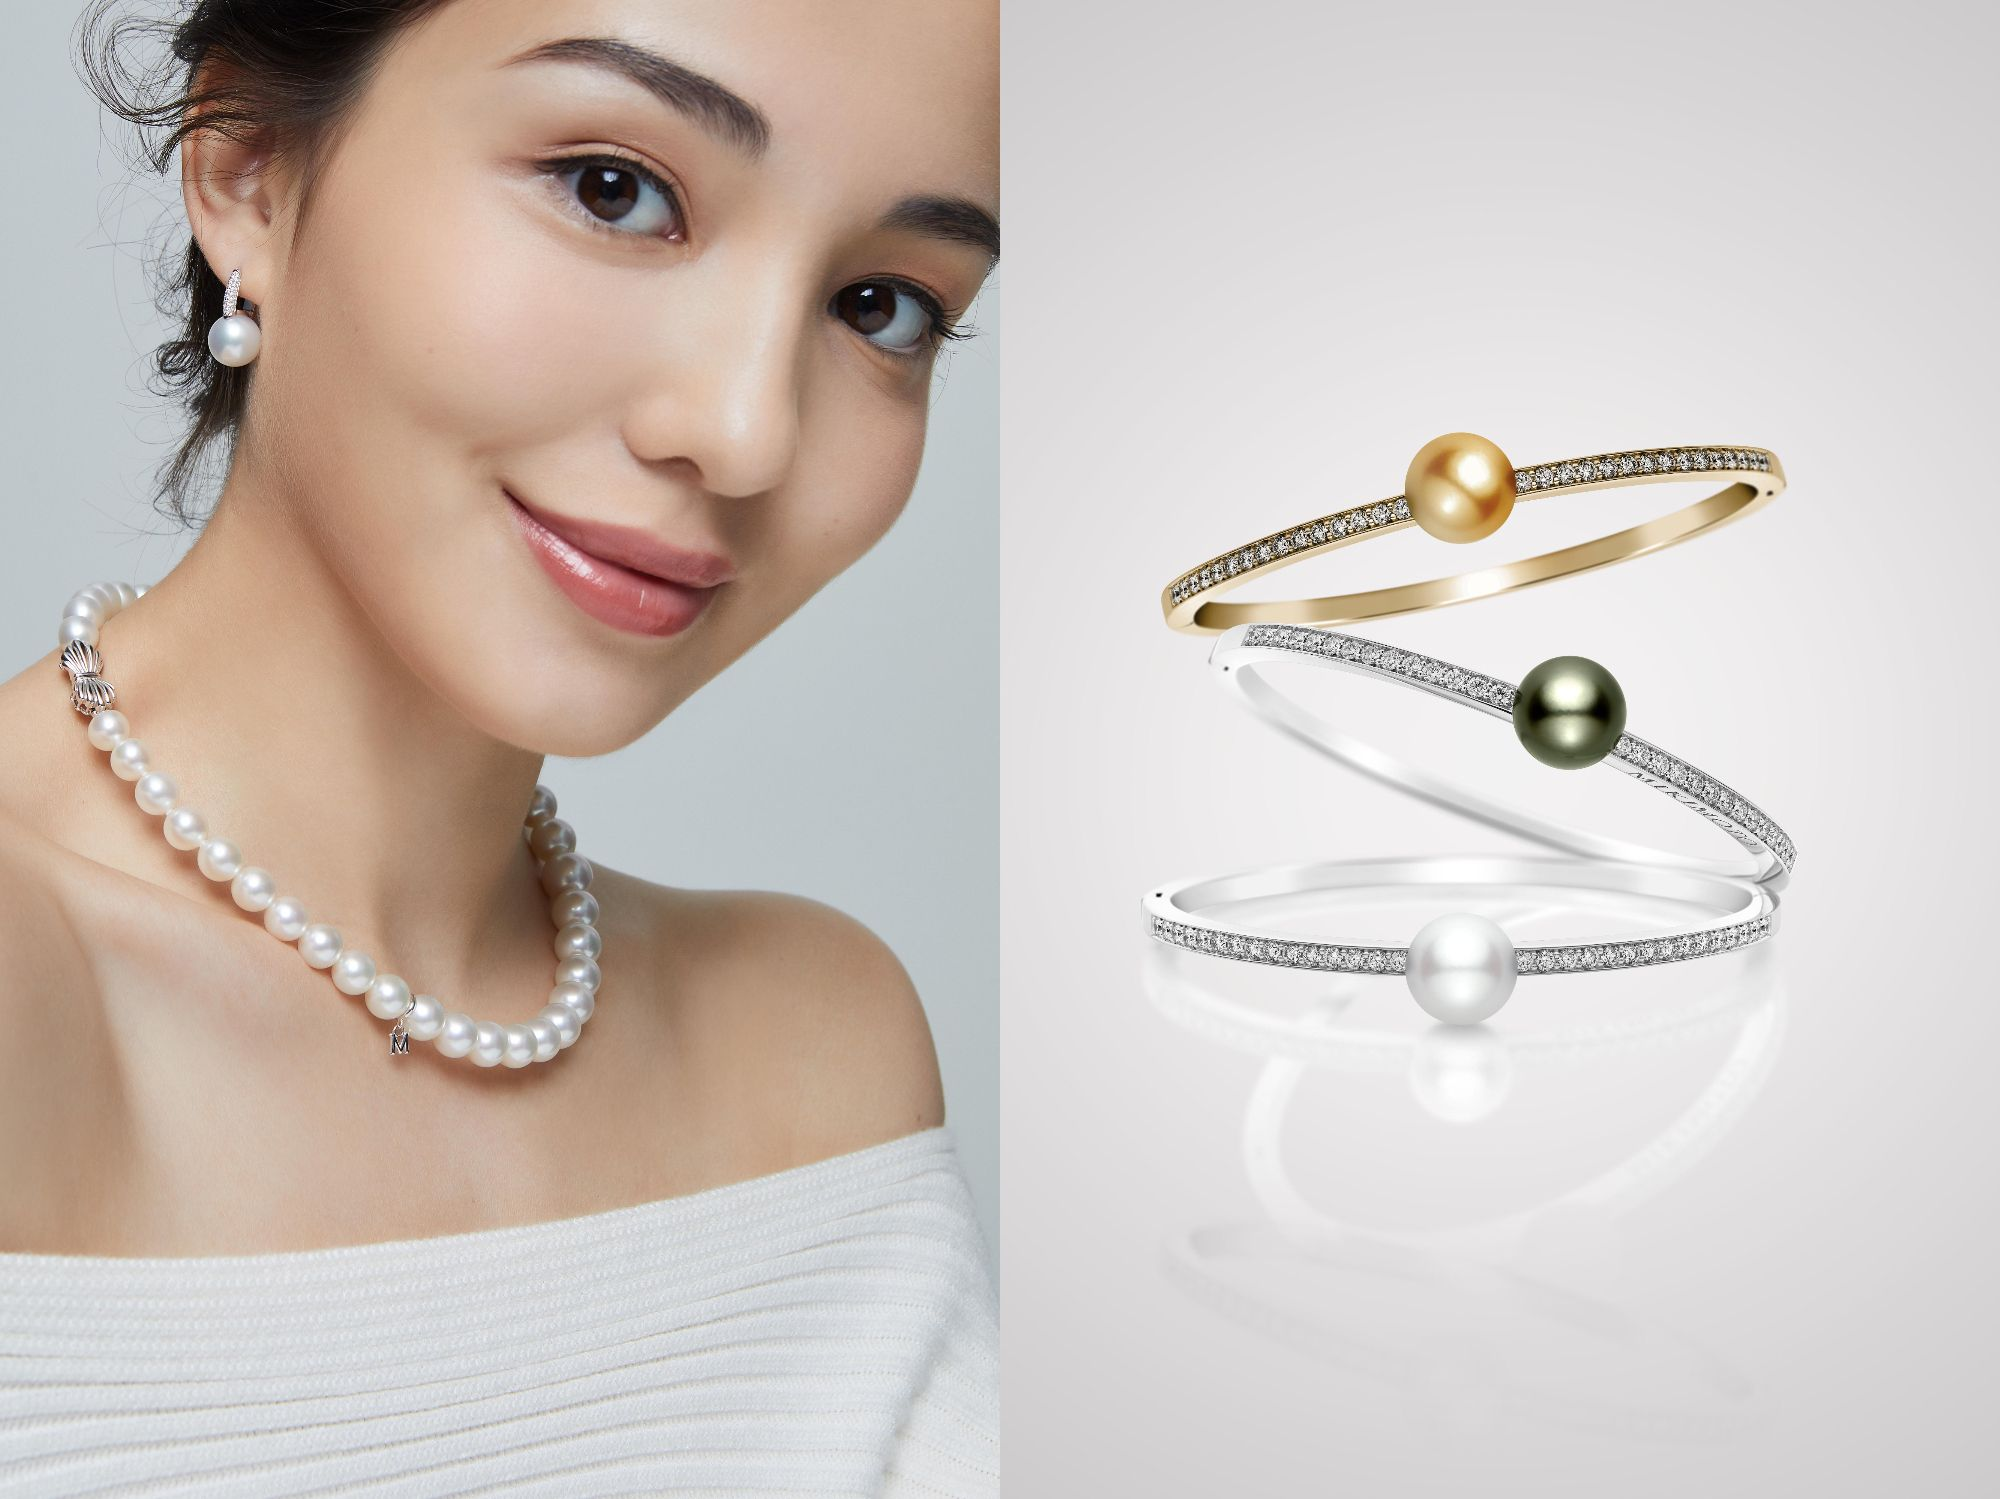 Mikimoto頂級珍珠飾品—為母親獻上來自大海的美麗